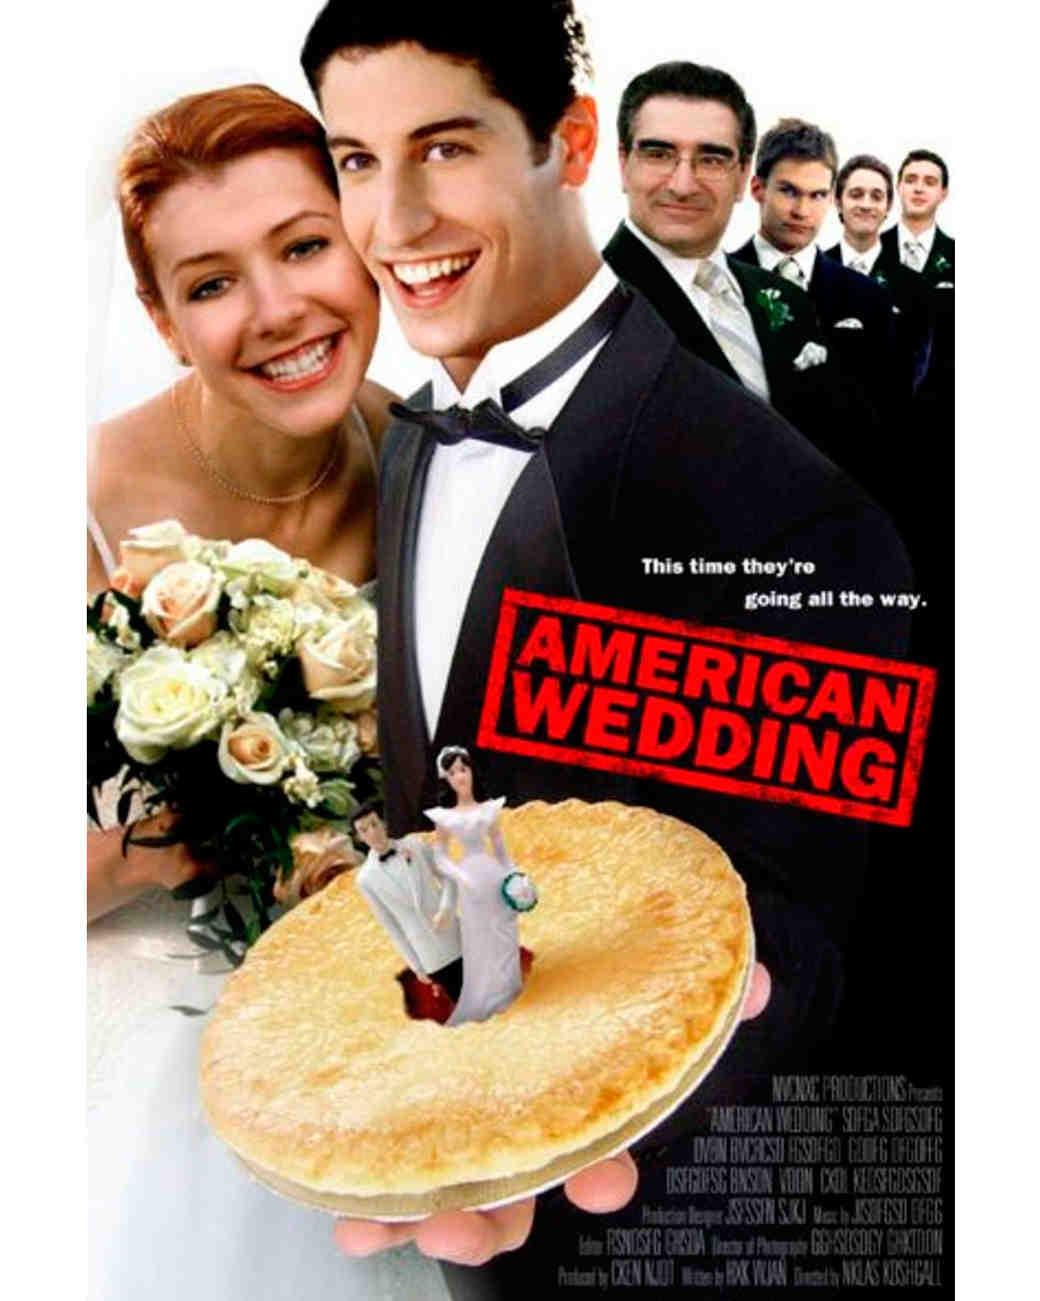 Life.Film Wedding Videography&Photography